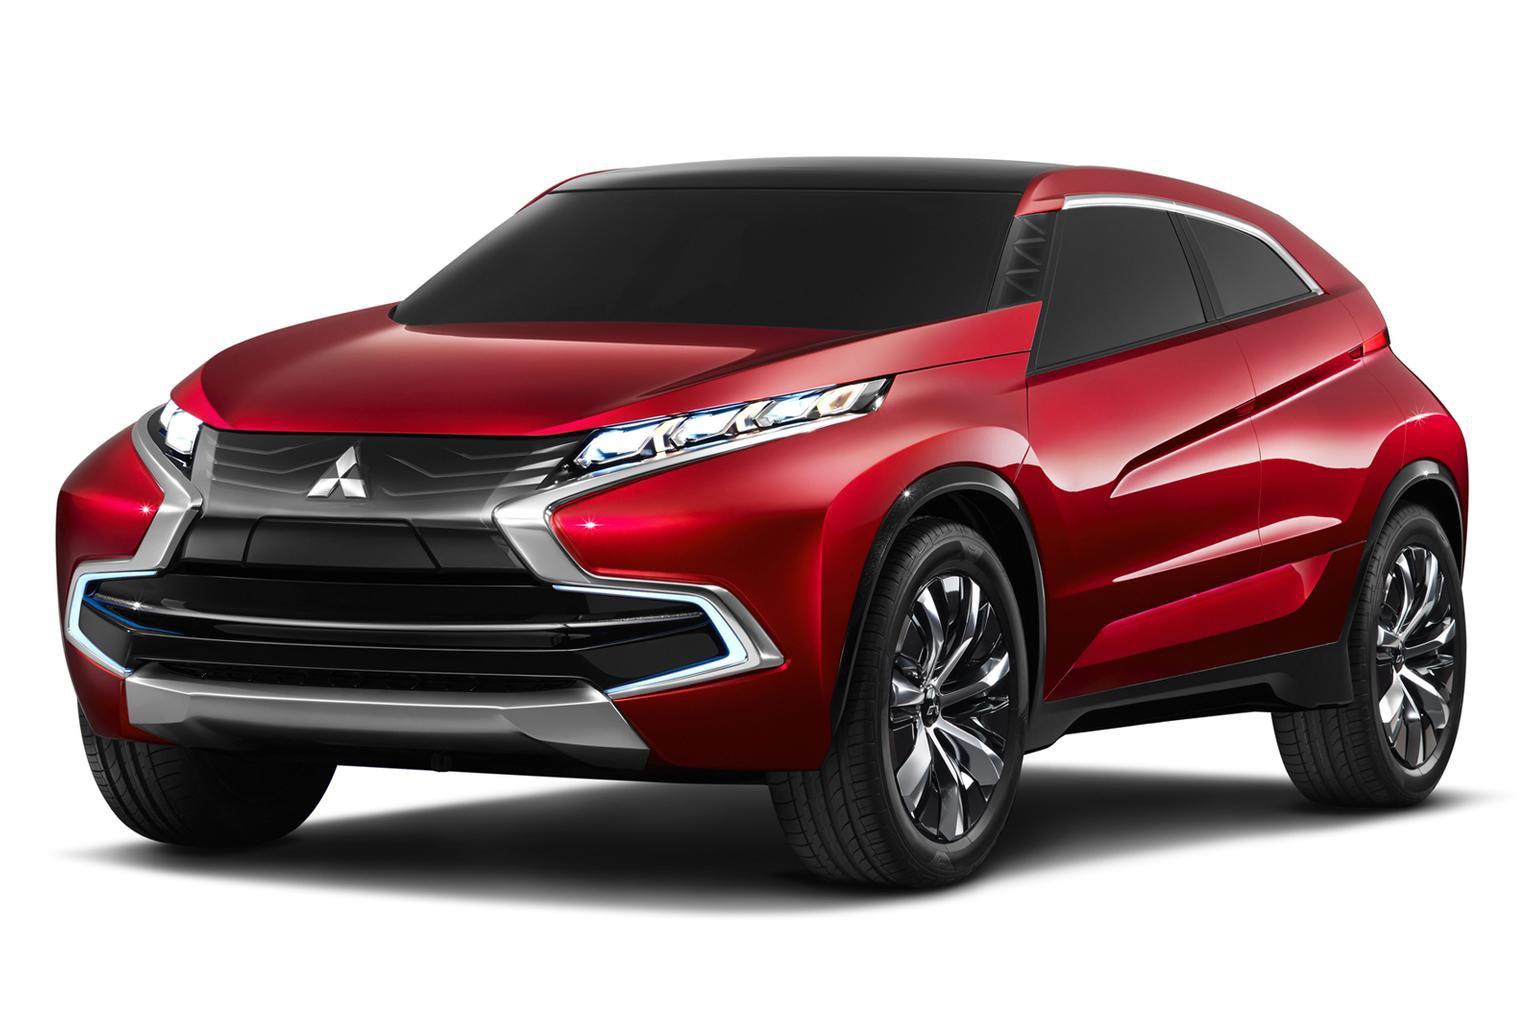 Mitsubishi previews Qashqai rival